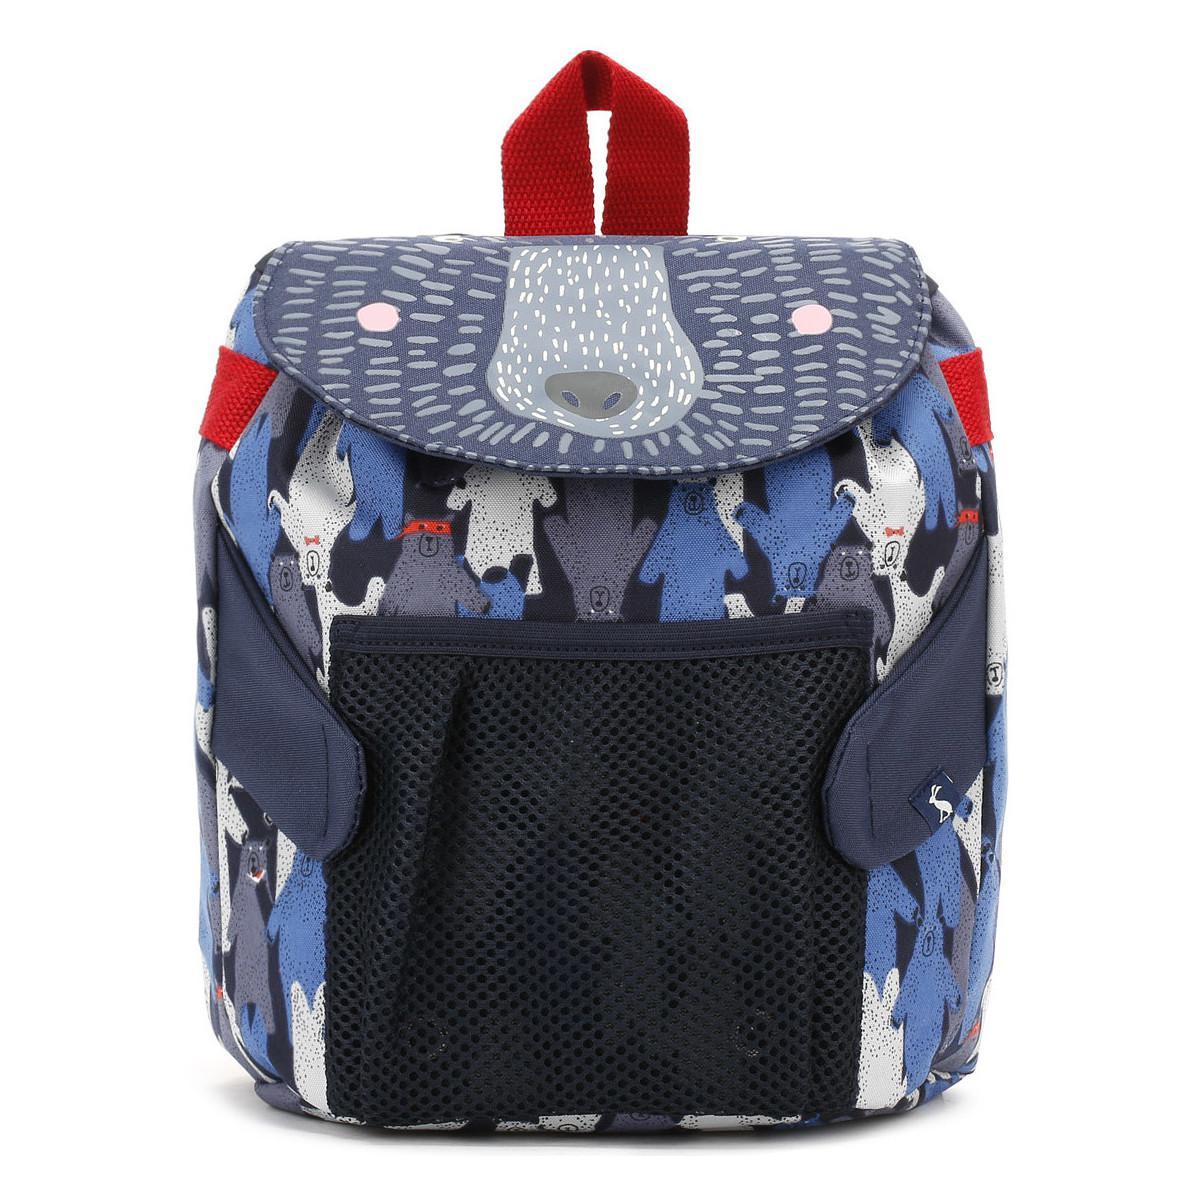 Joules Black Multi Bear Camo Buddie Bag Boys s Children s Backpack ... a4602dbeb822f